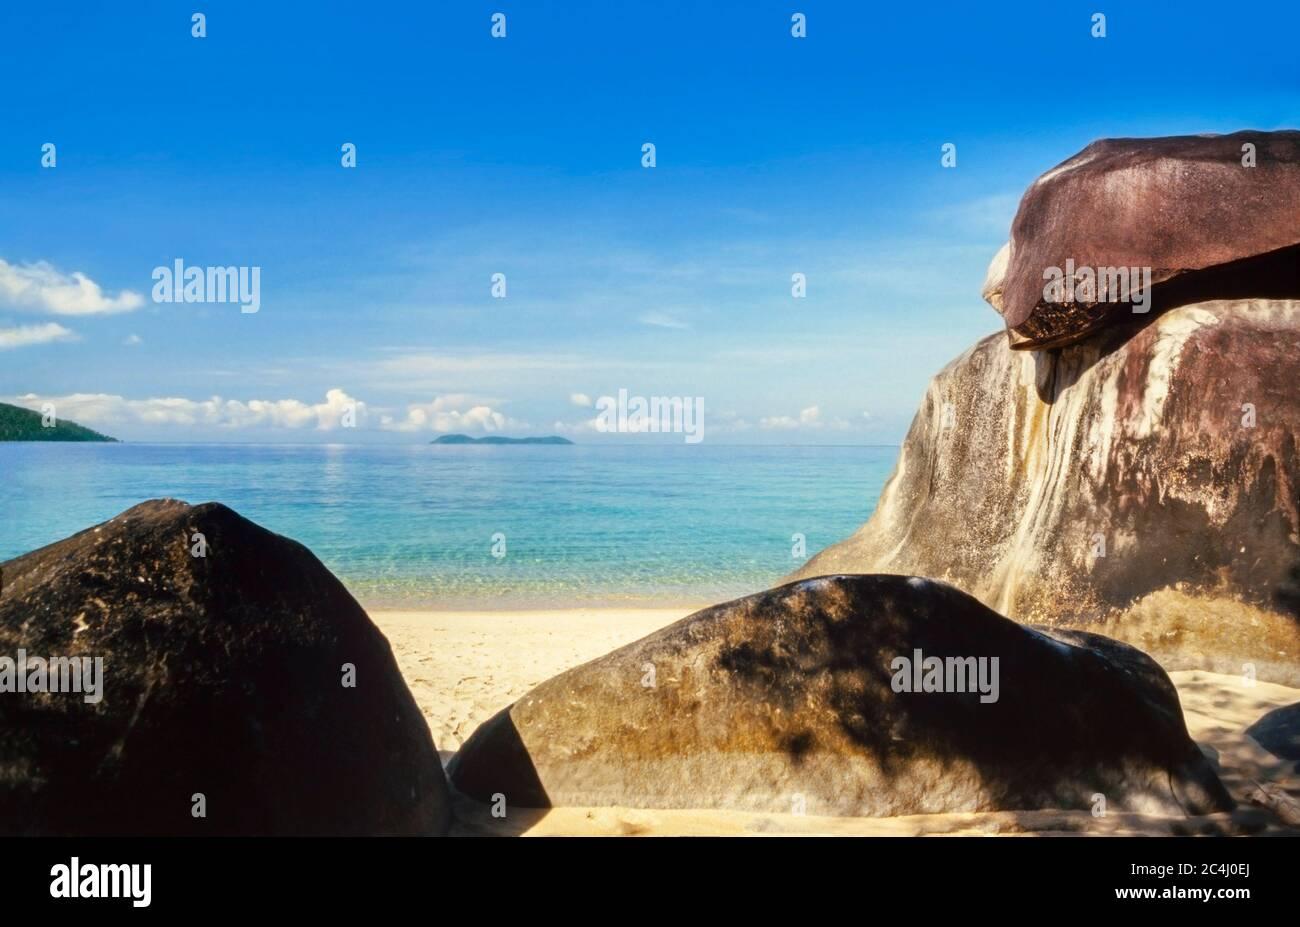 Pulau Tioman (isla) Malasia, escena de playa, sol brillante Foto de stock